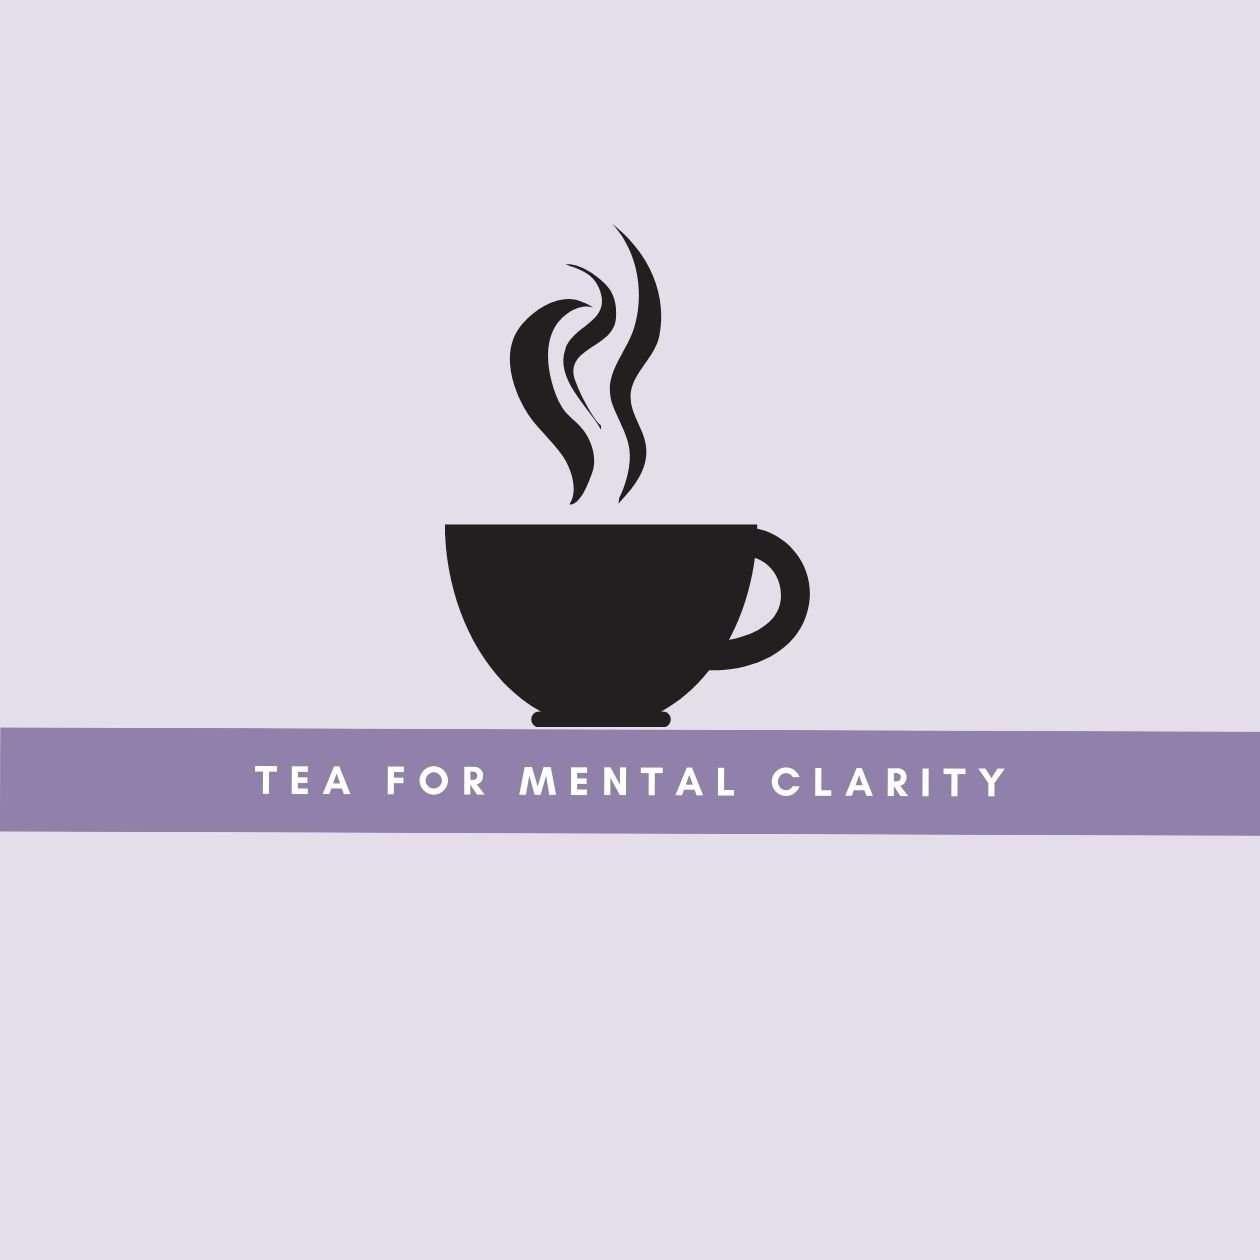 Tea for mental clarity: an illustration